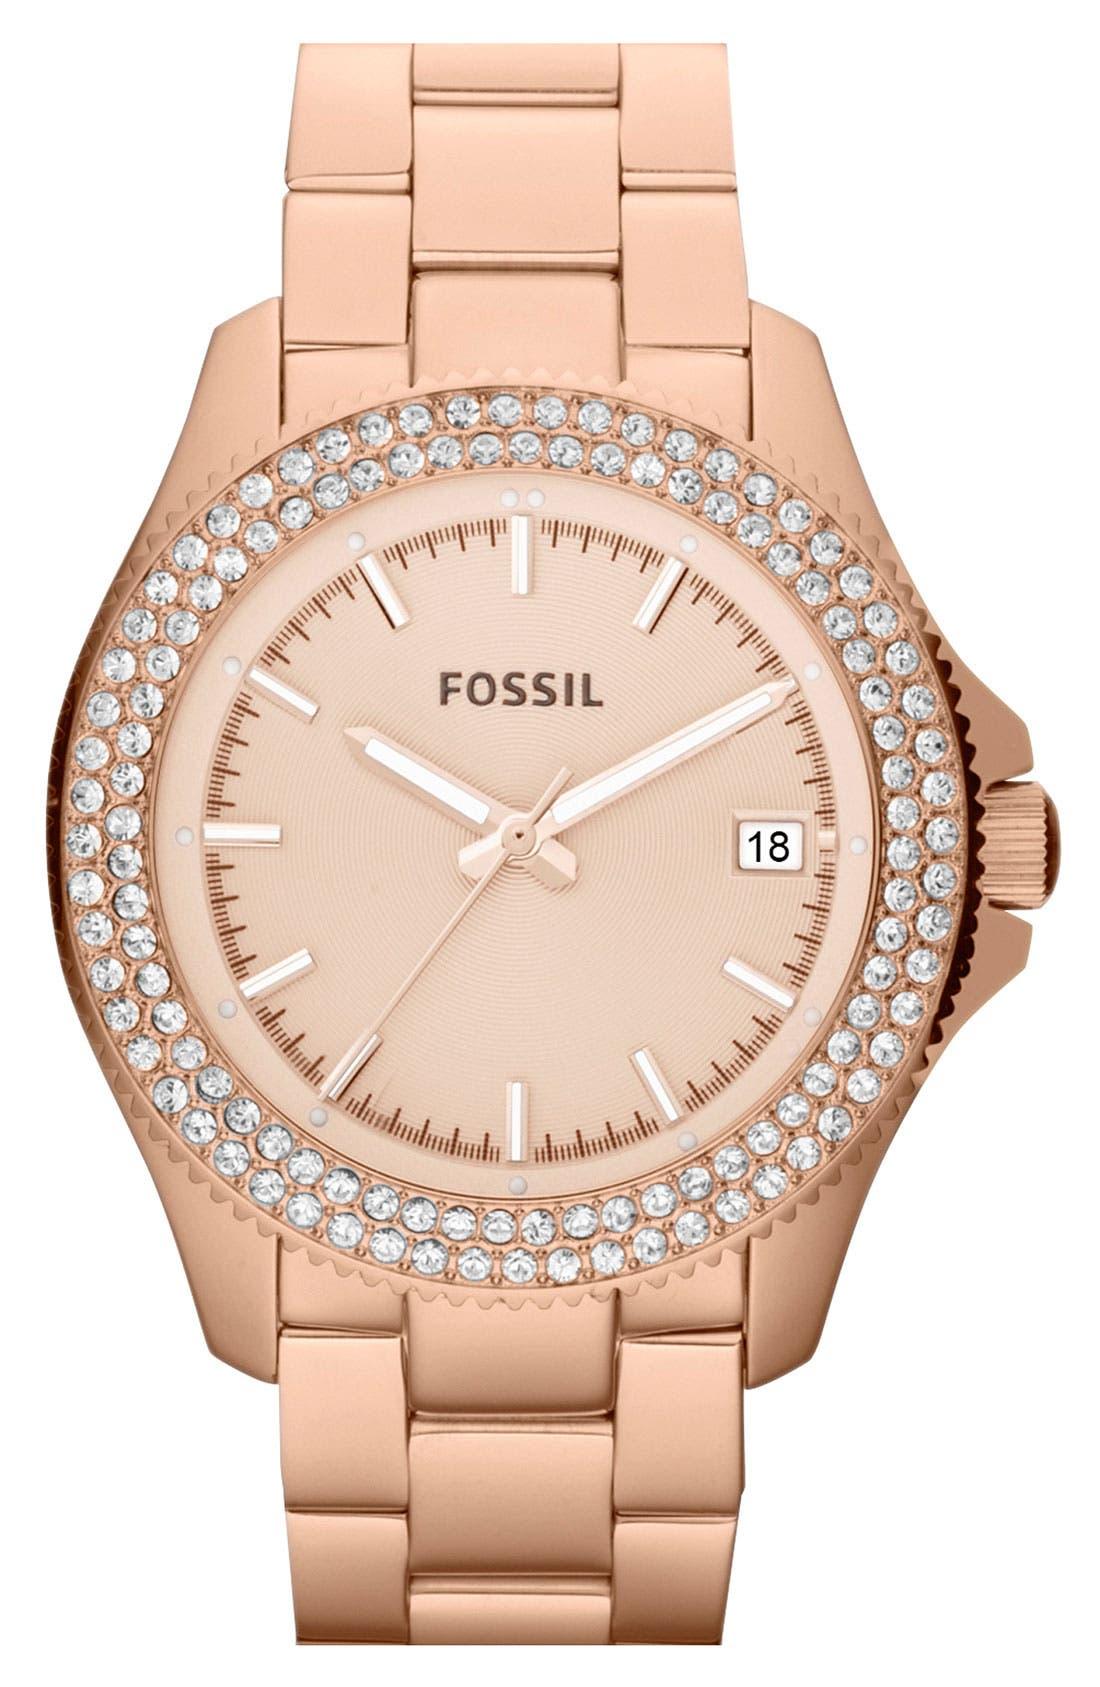 Main Image - Fossil Round Crystal Bezel Bracelet Watch, 36mm